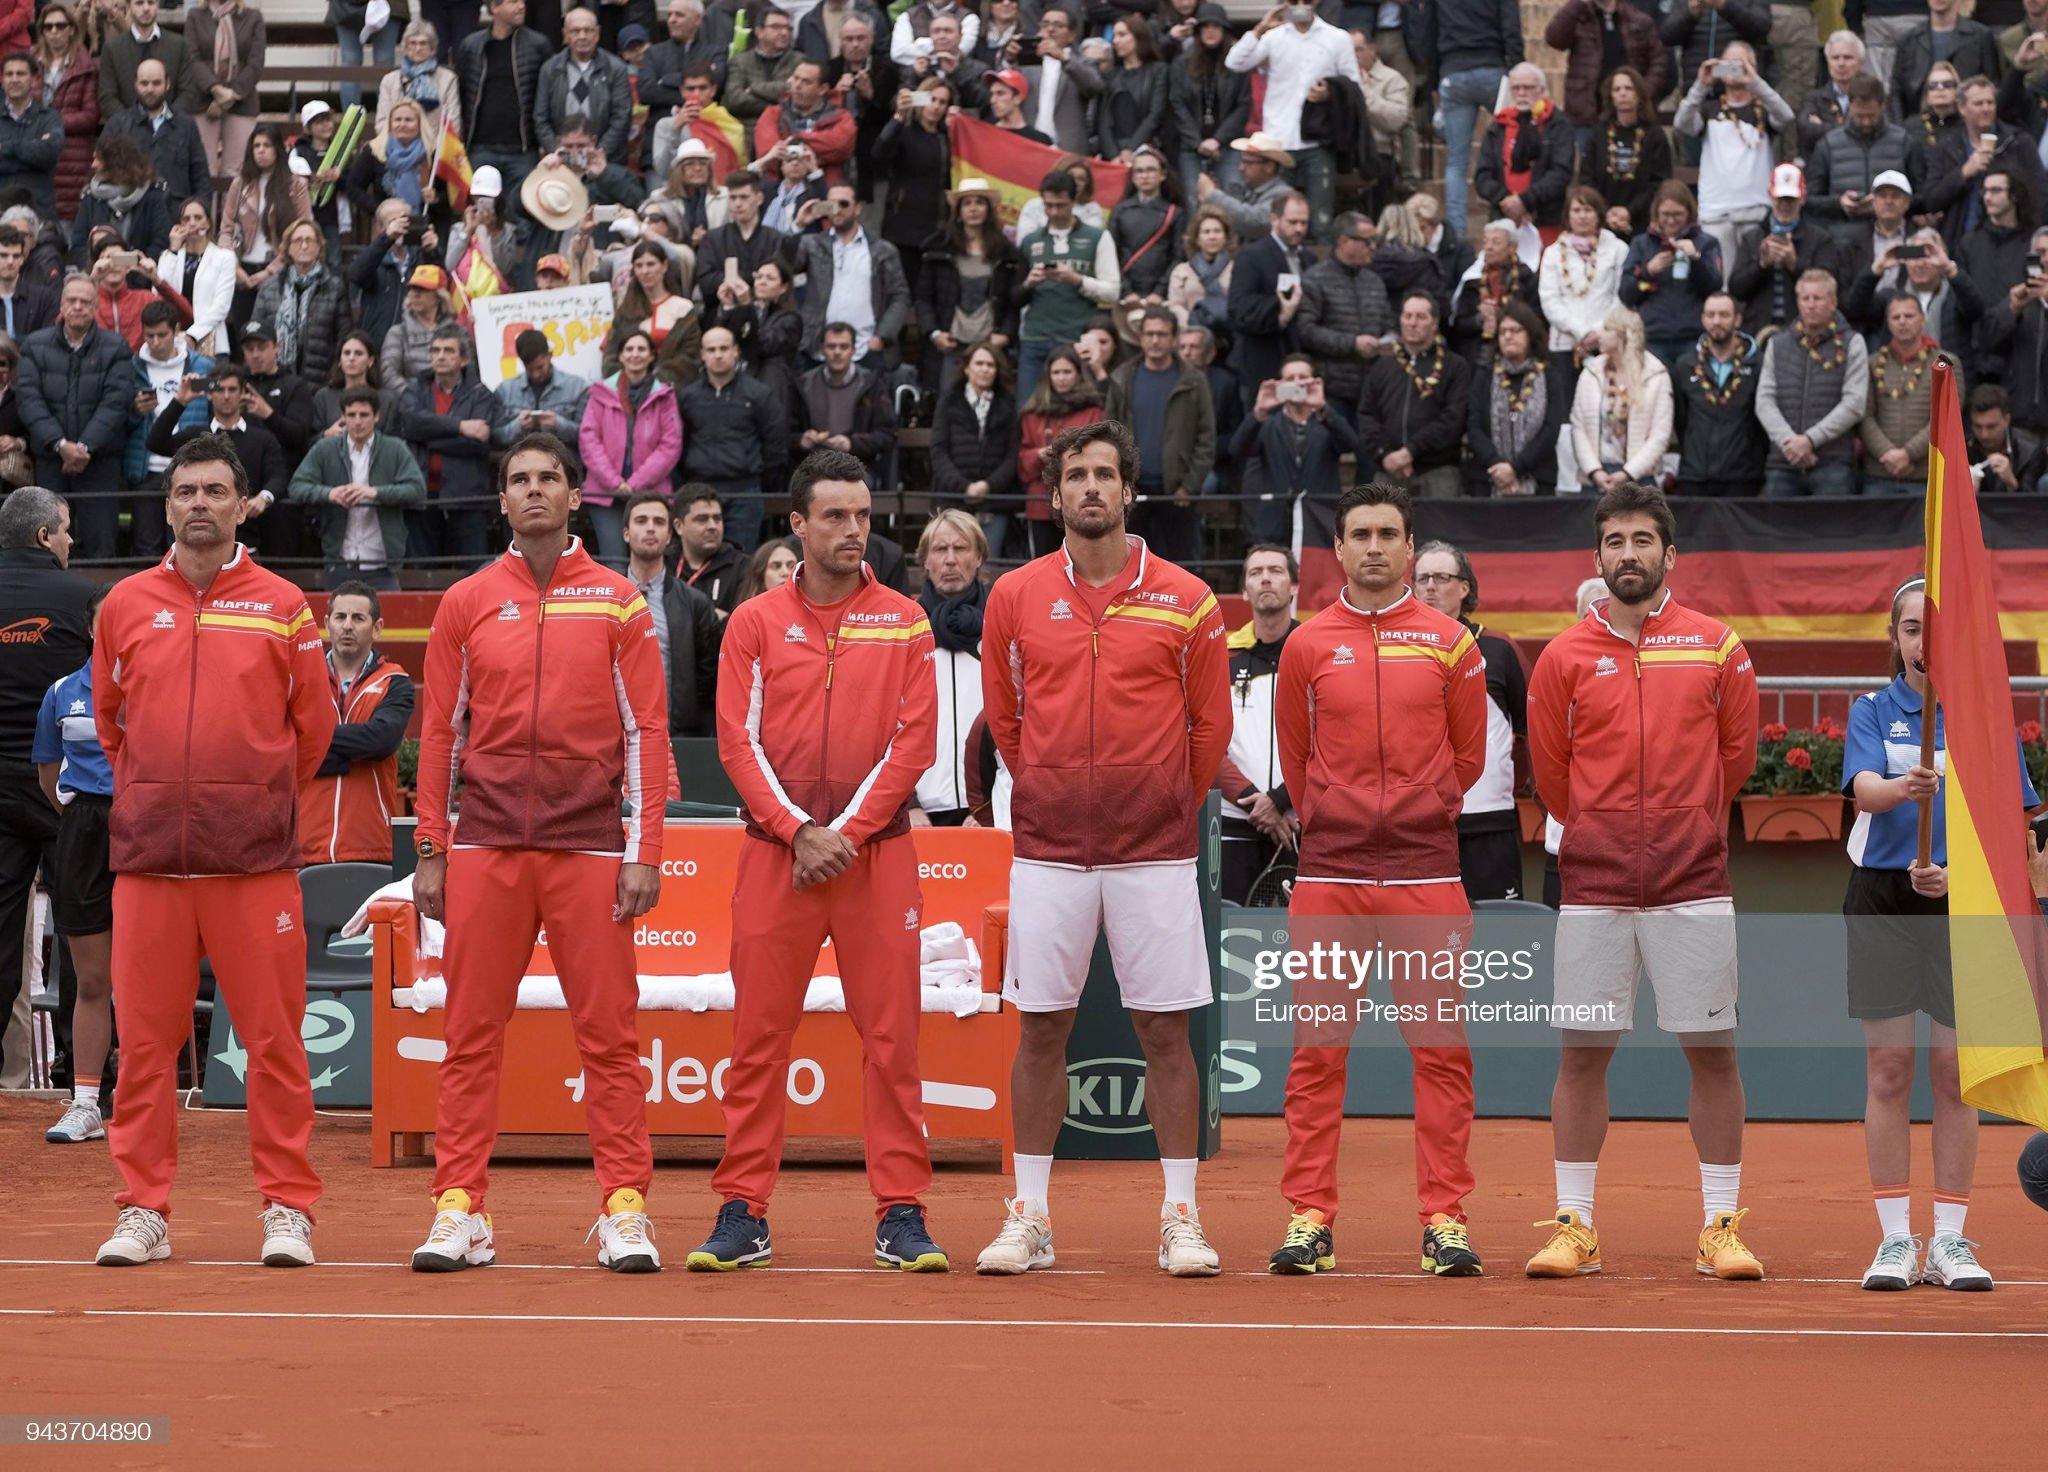 ¿Cuánto mide Roberto Bautista? - Altura - Real height The-spanish-team-sergi-bruguera-rafael-nadal-roberto-bautista-agut-picture-id943704890?s=2048x2048